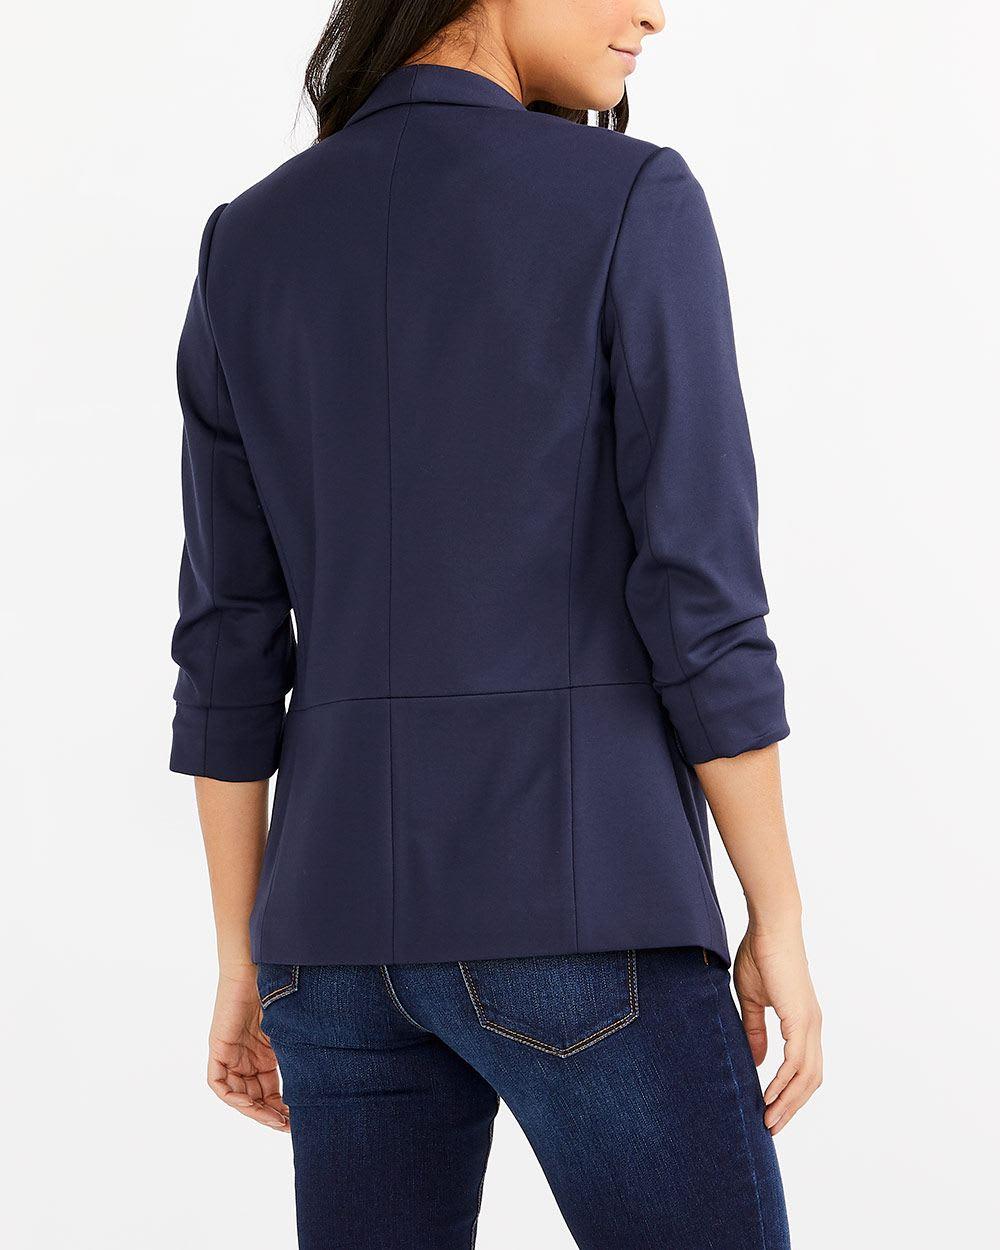 Ruched ¾ Sleeve Open Blazer